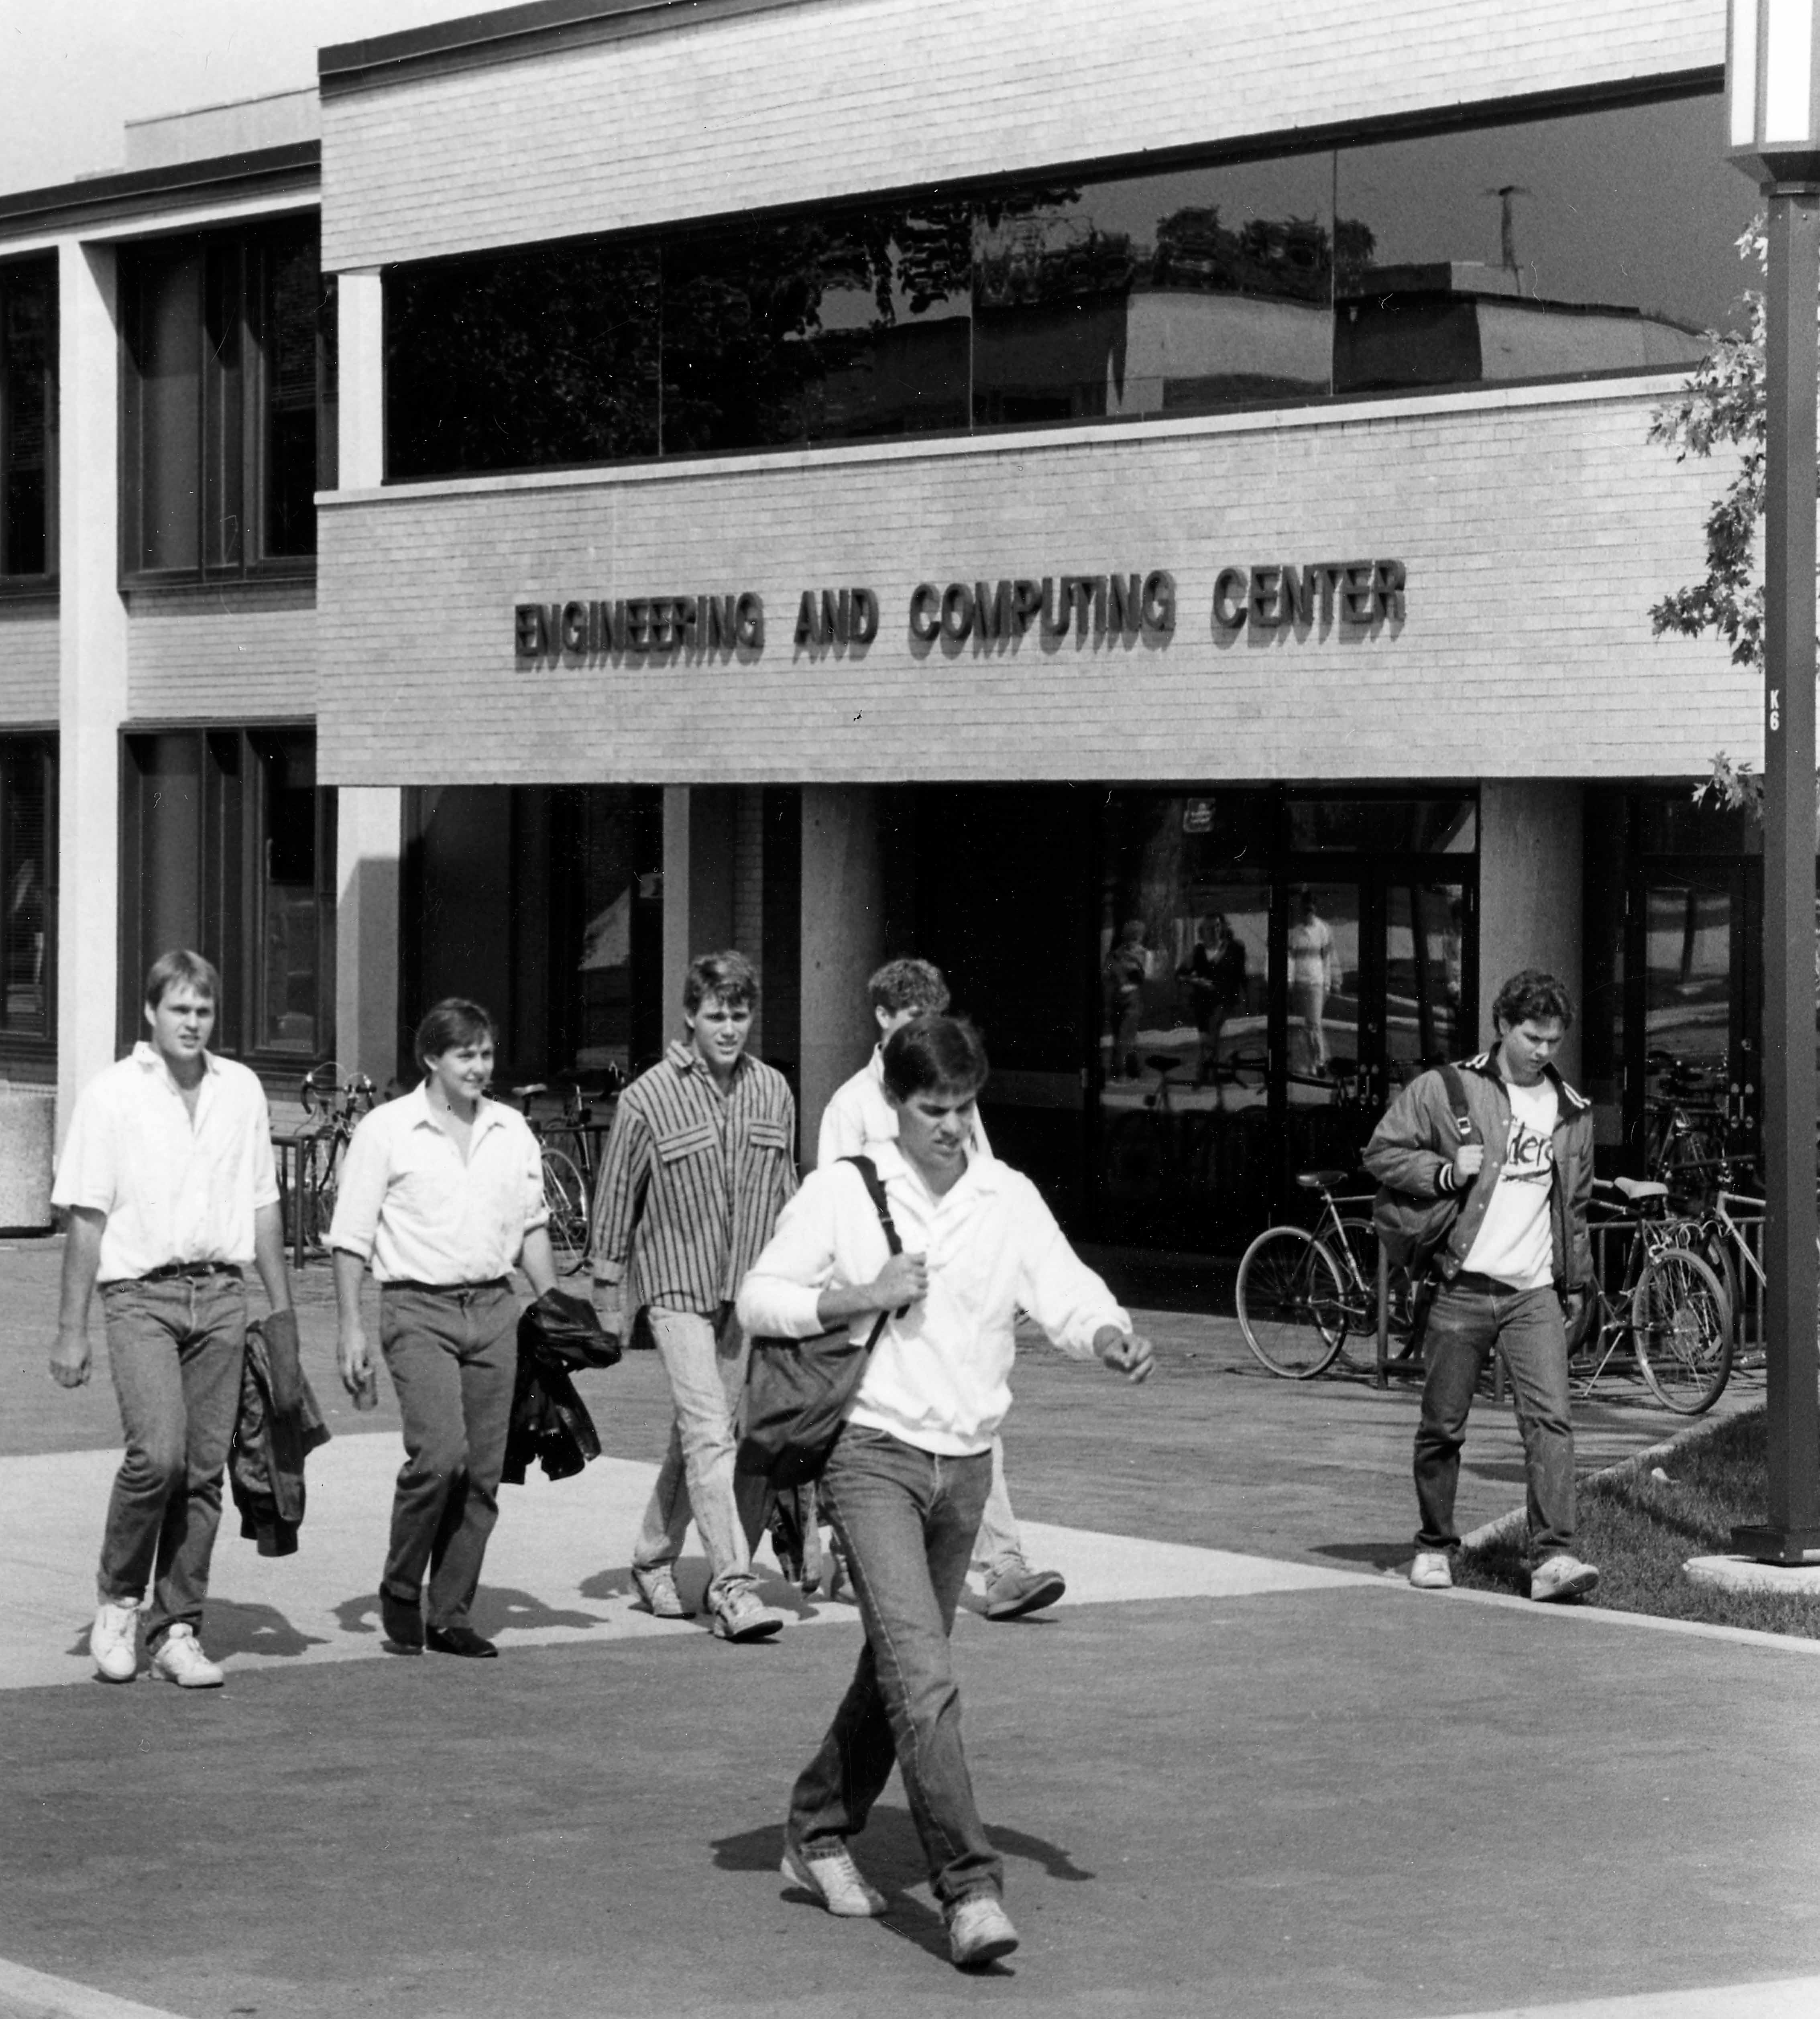 Engineering and Computing Center